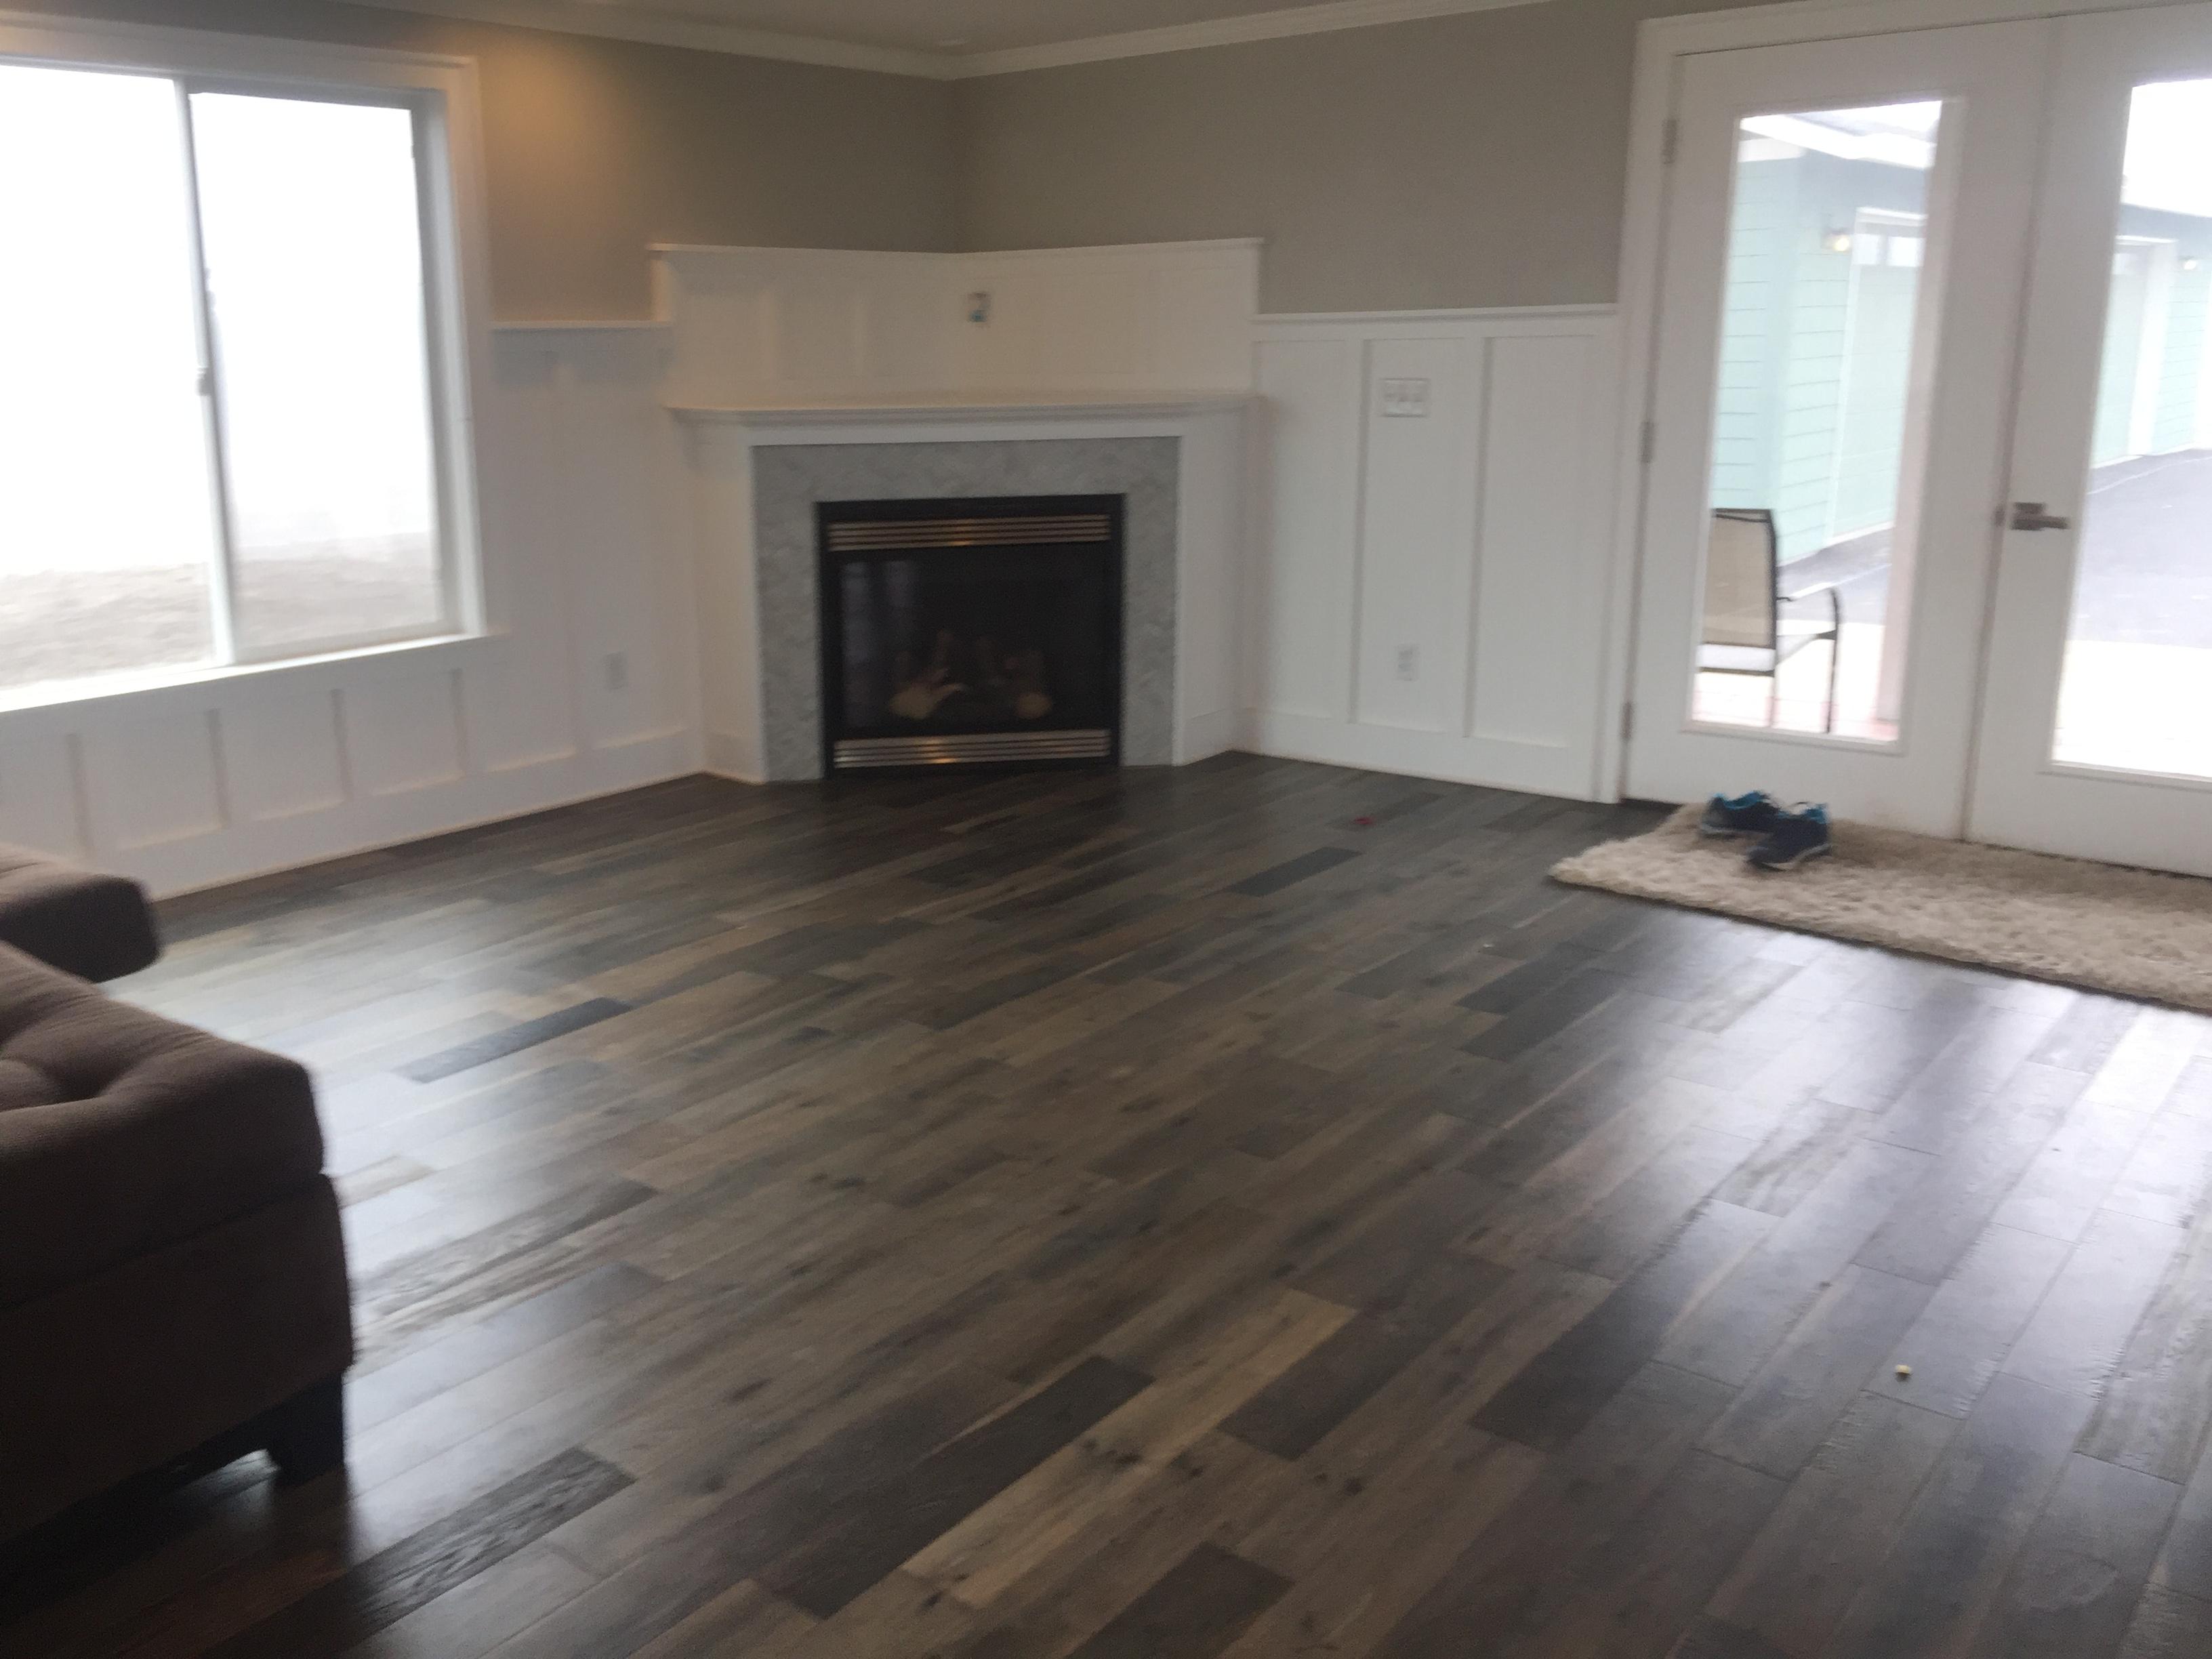 Wood Stain Living Room Daylighting, Estate Living Laminate Flooring